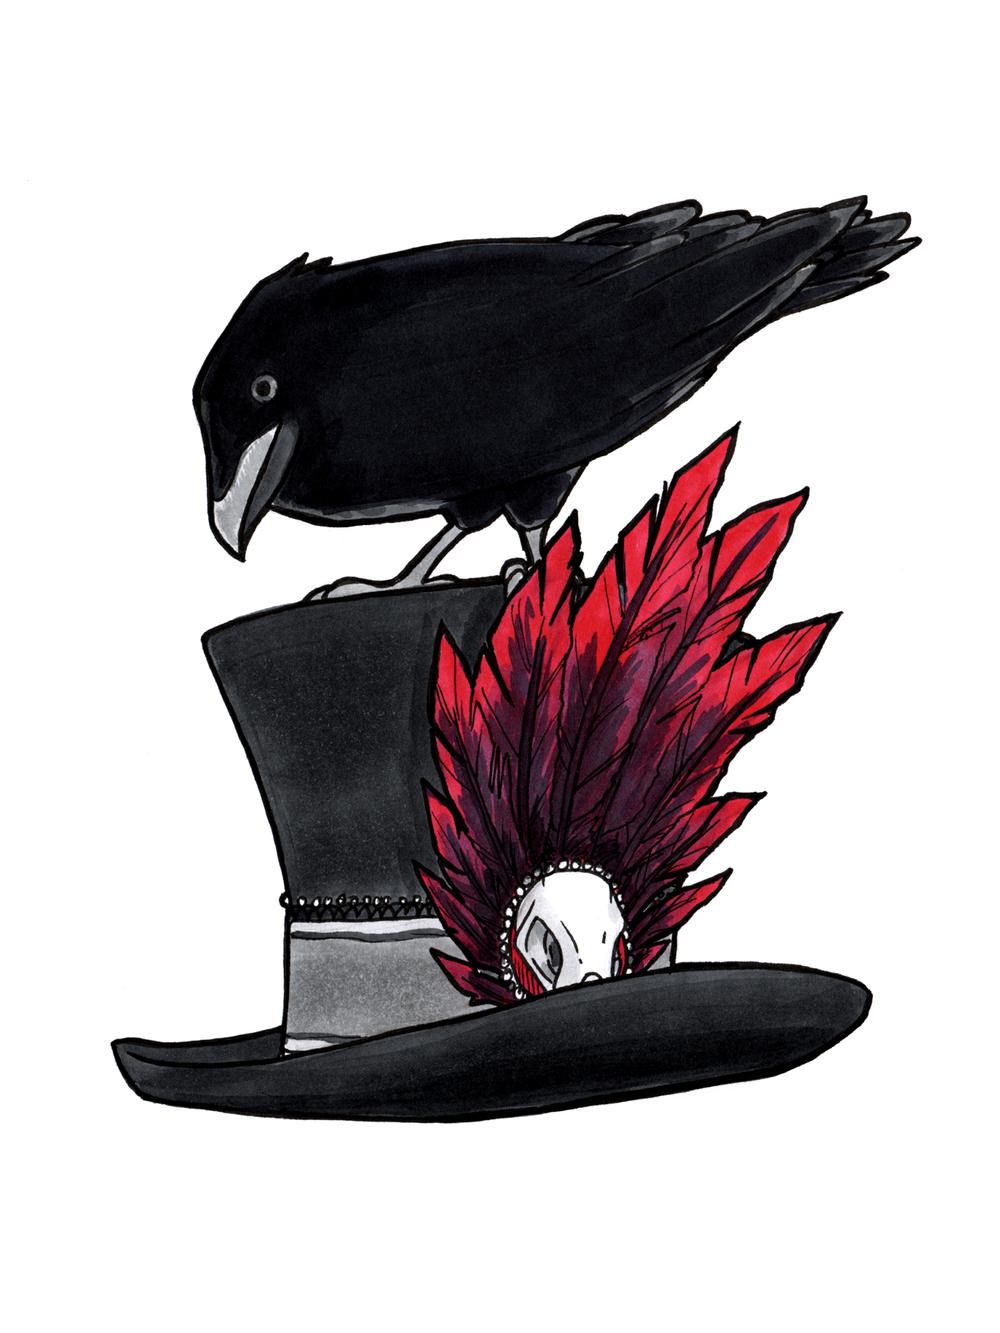 Day 28 - Raven